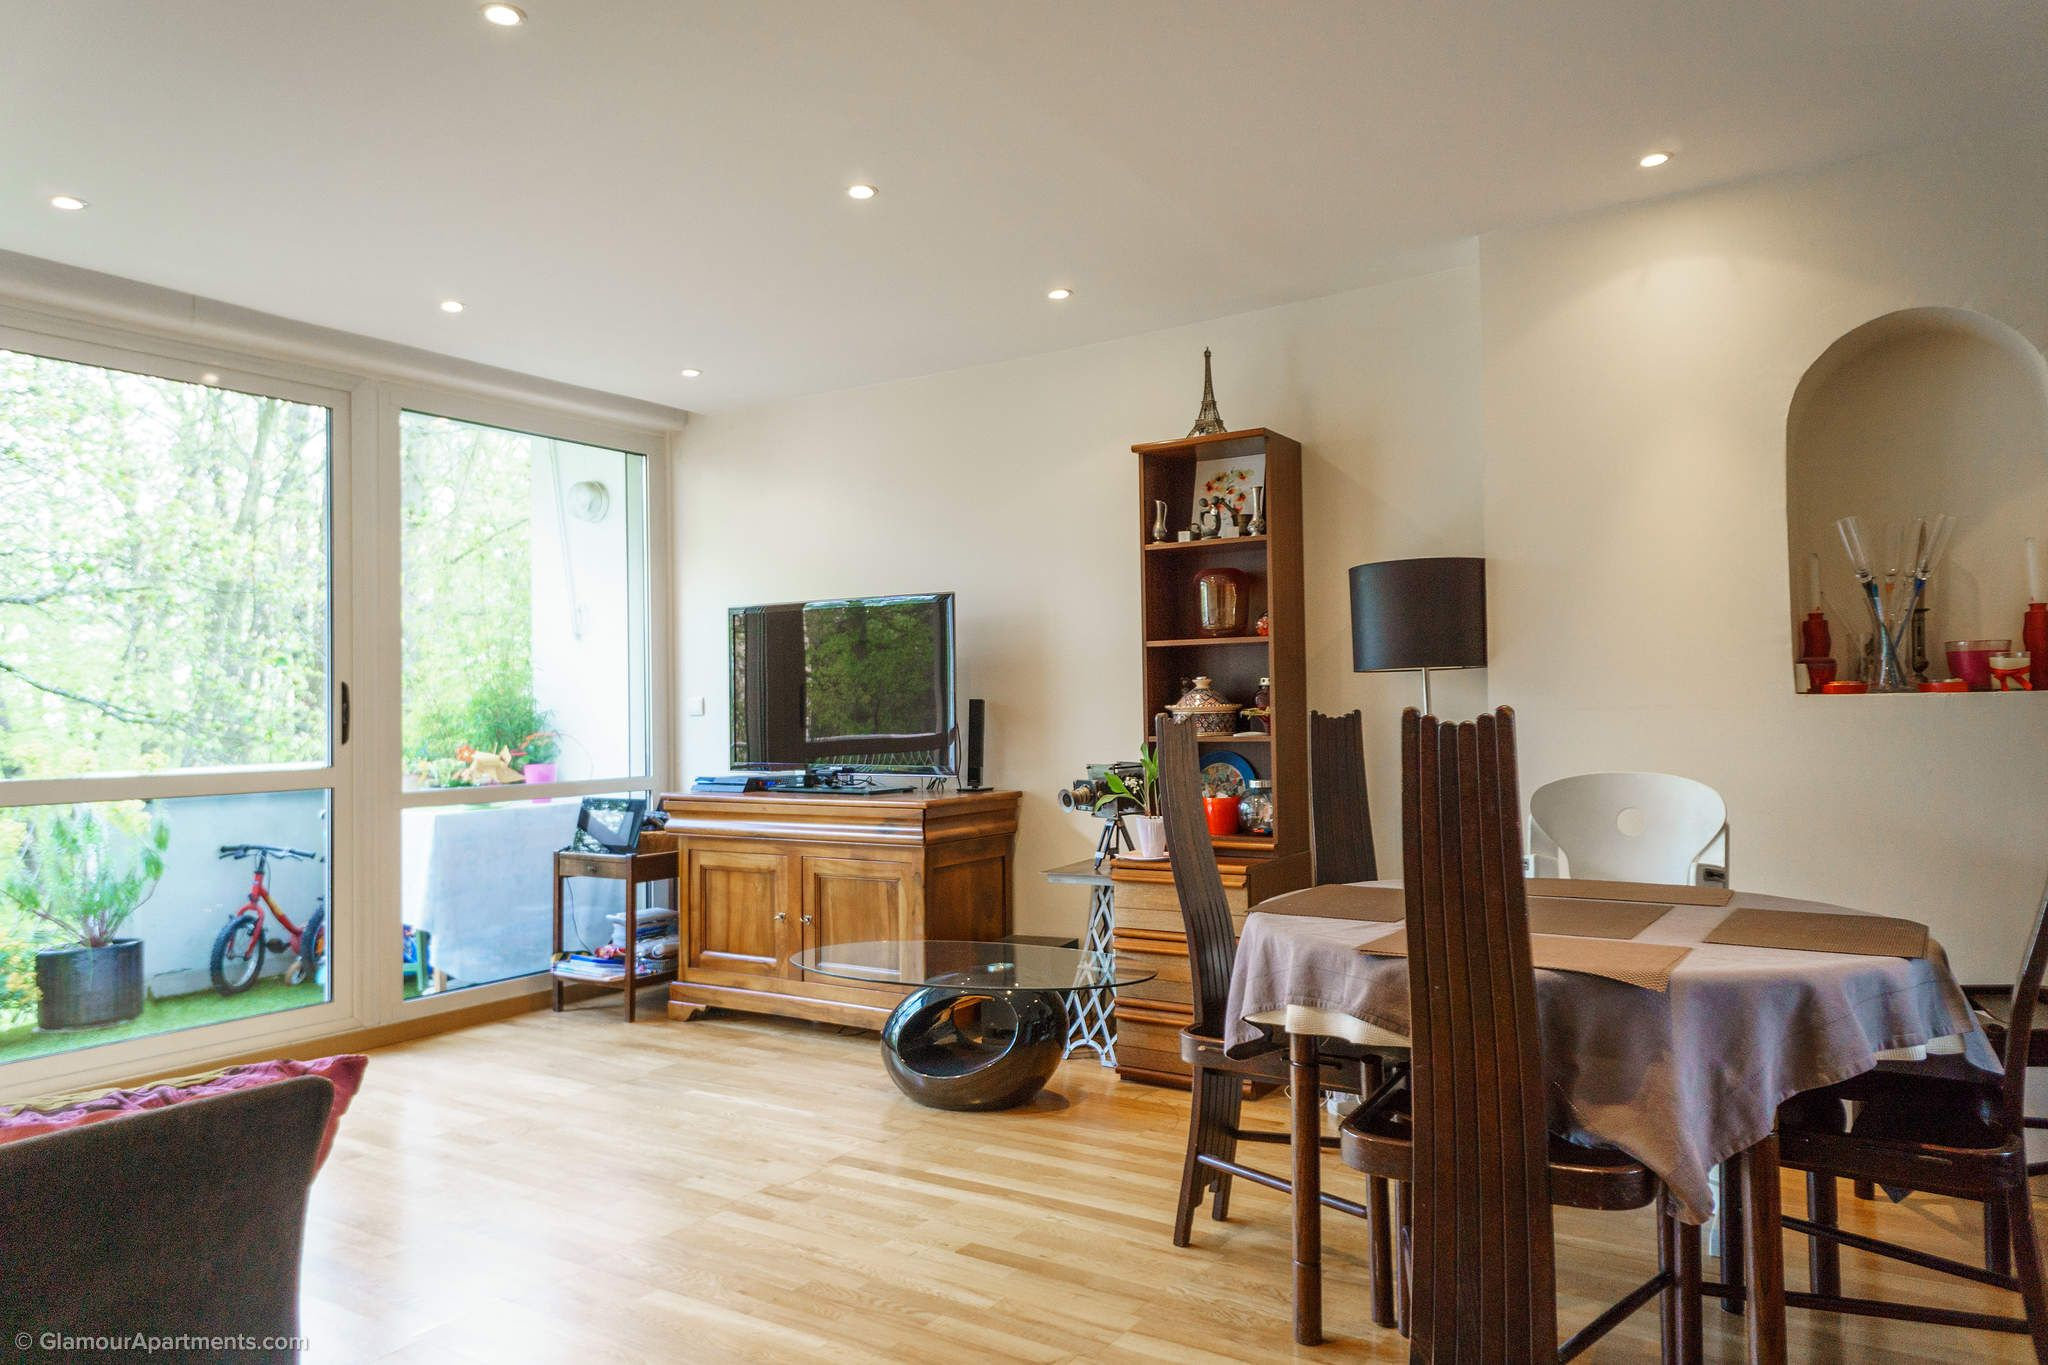 Apartment for sale in a Paris suburb - Vaucresson ...